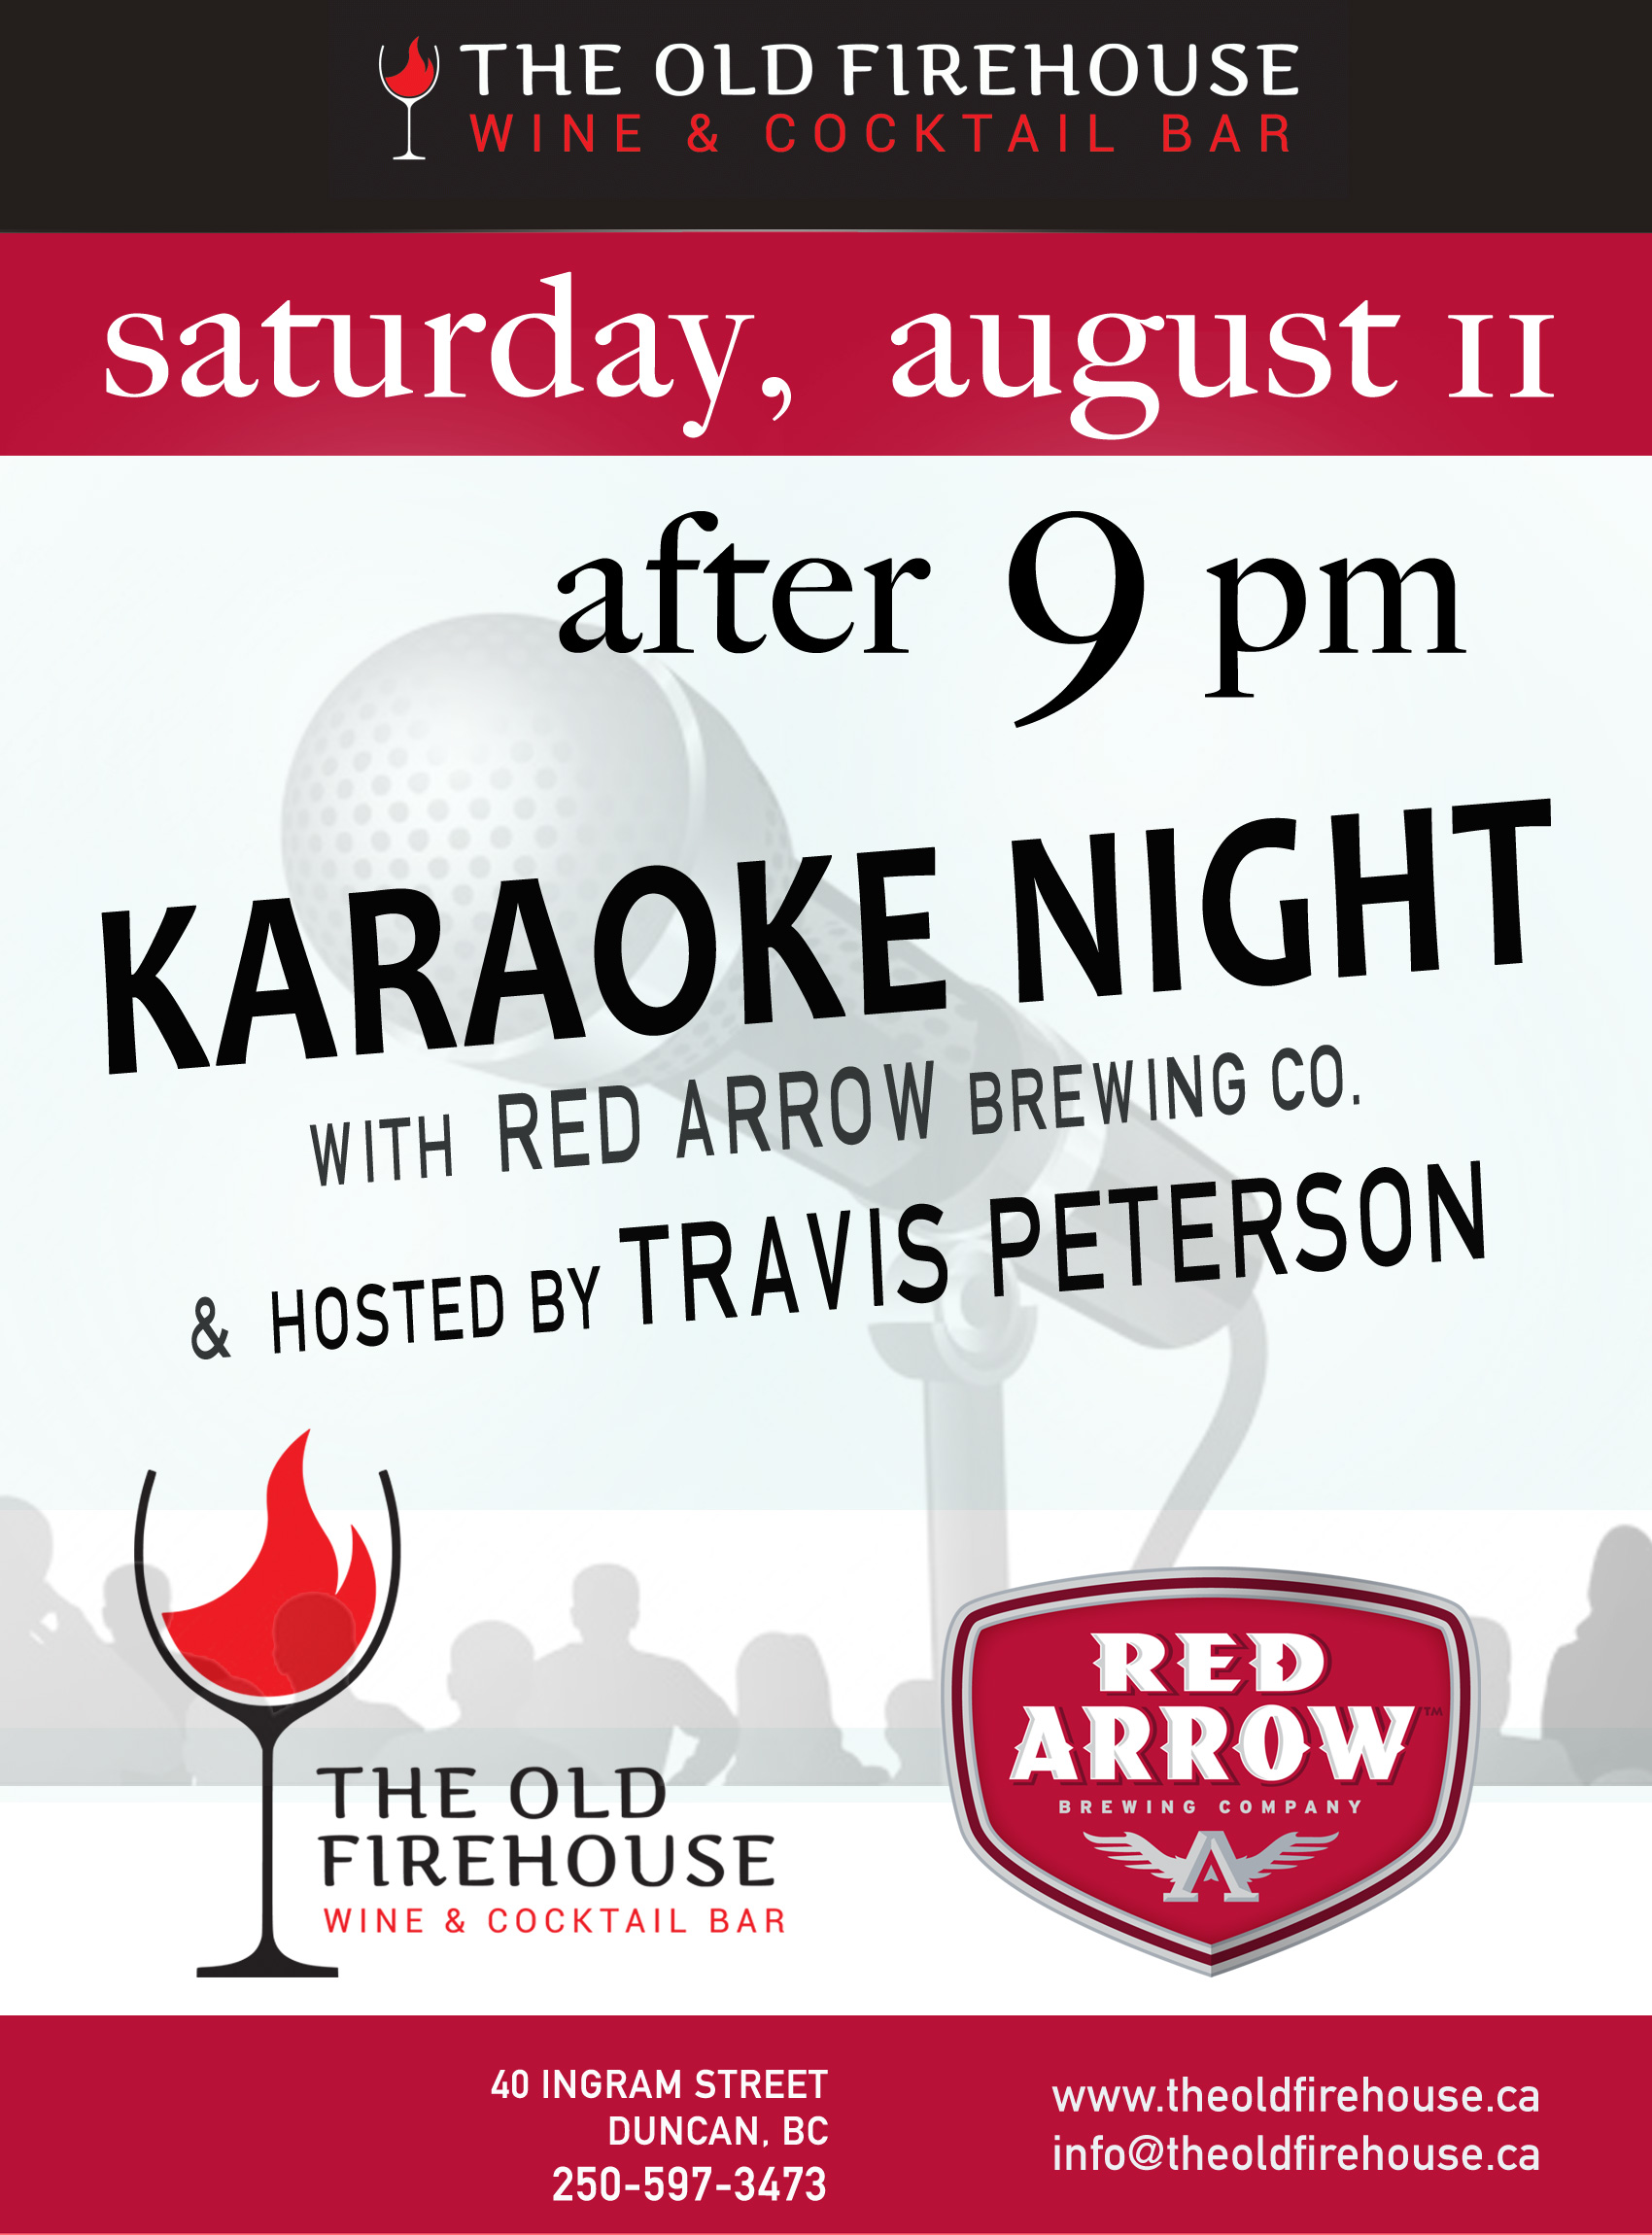 karaoke-poster-red-arrow-august-11.jpg